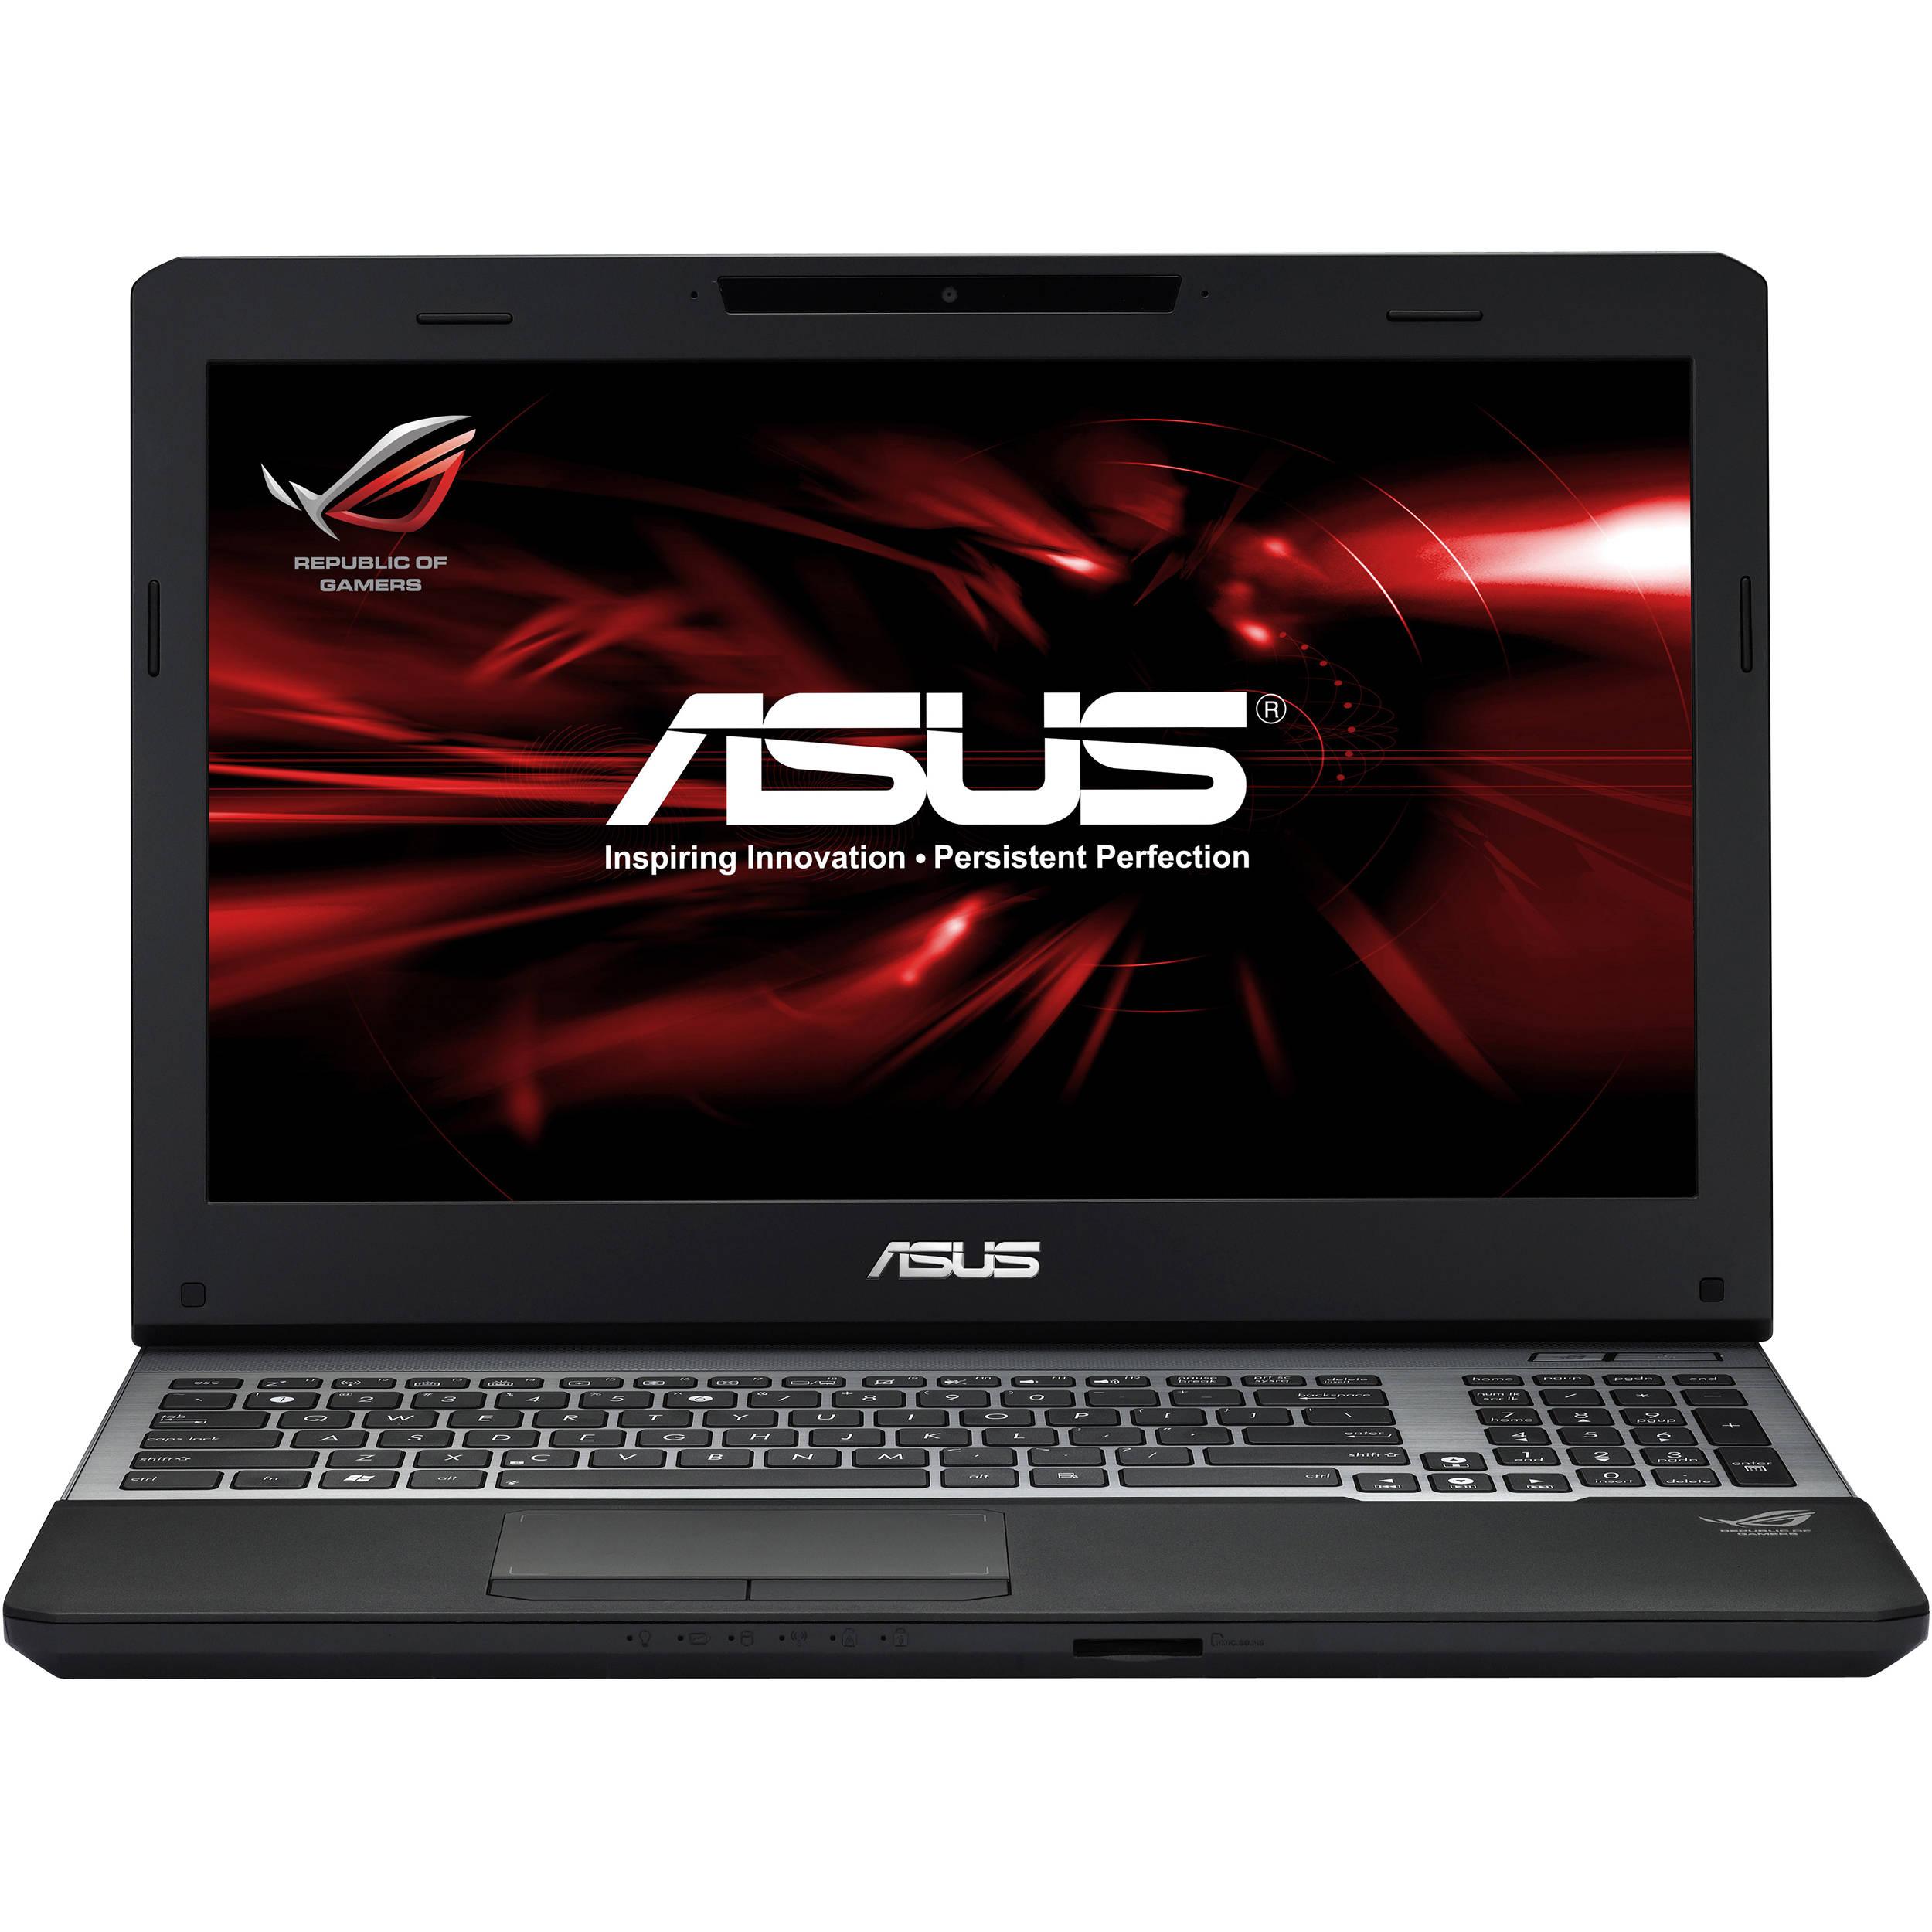 Asus Republic Of Gamers G55vw Dh71 15 6 Laptop Computer Black